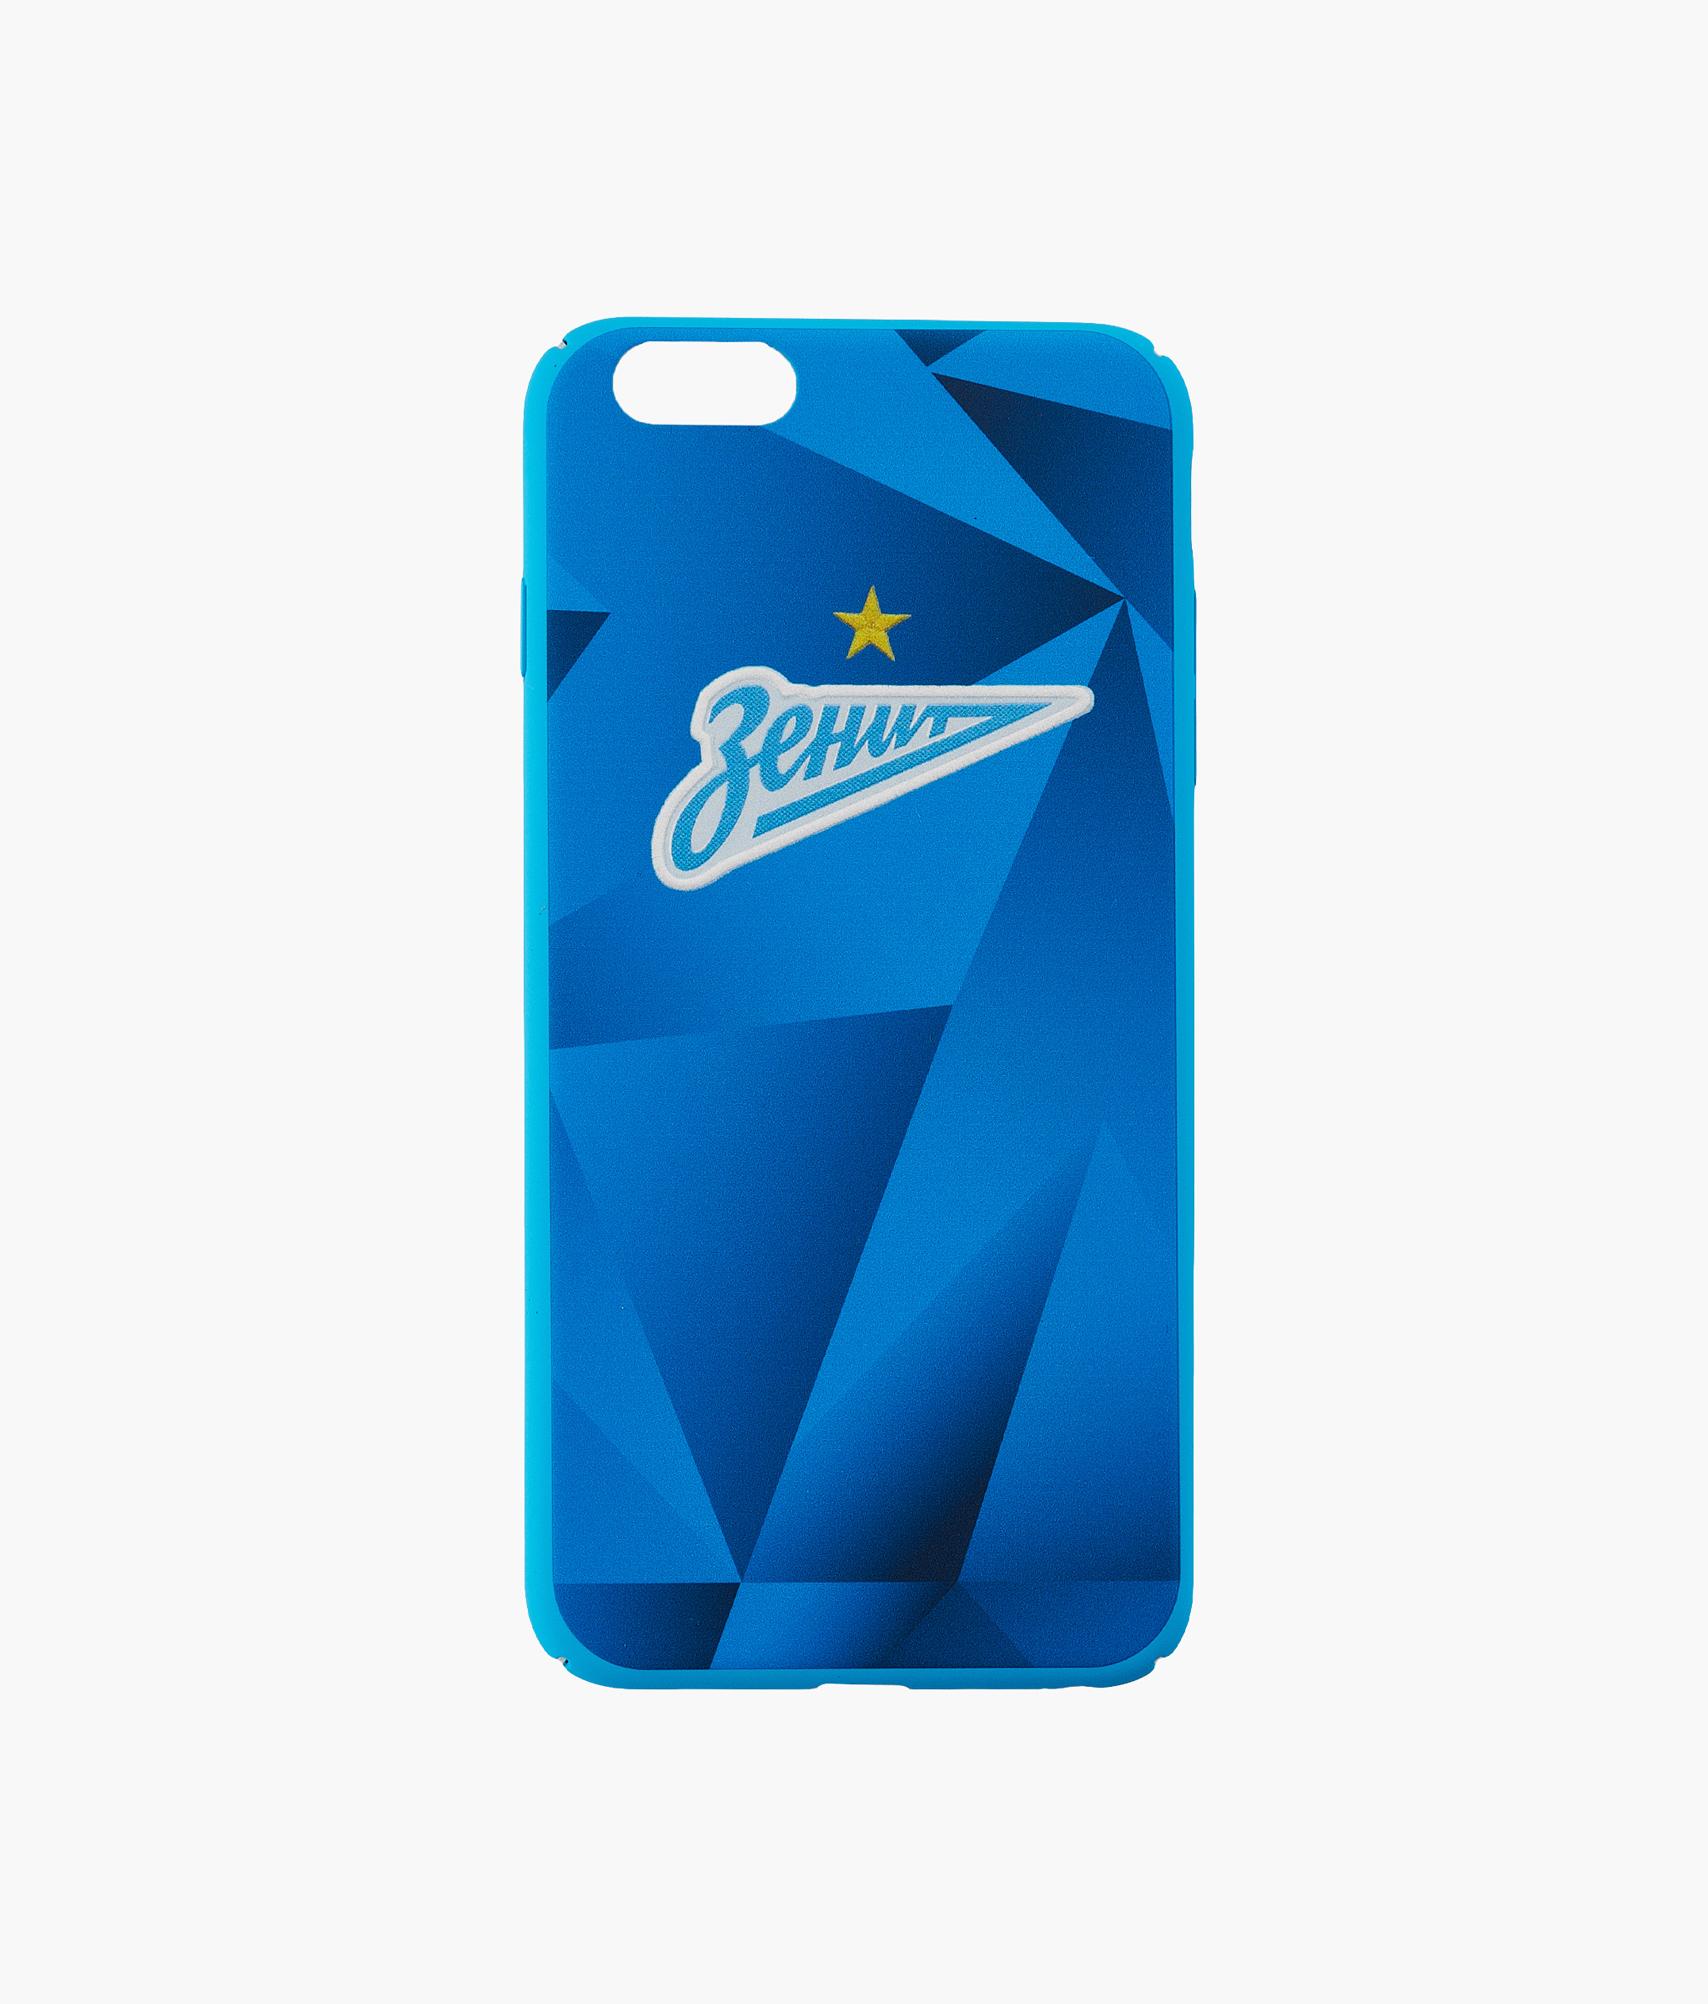 Фото - Чехол для IPhone 6/6S Plus «Форма 2019/20» Зенит Цвет-Синий чехол накладка для apple iphone 6 6s deppa gel plus case 85213 pink клип кейс полиуретан